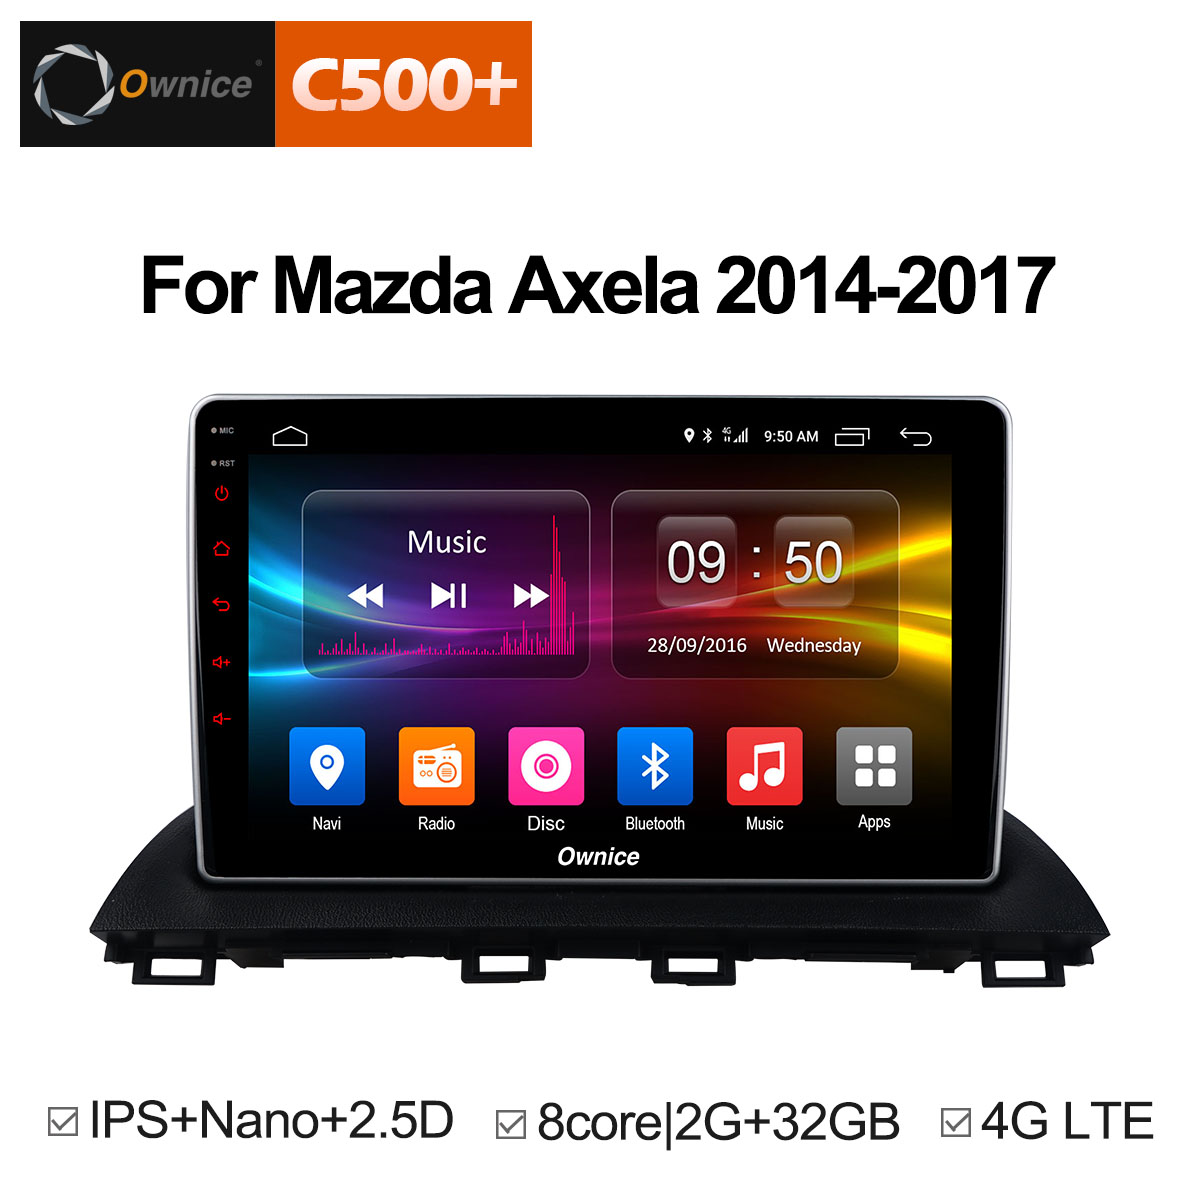 Ownice C500+ G10 Android 8.1 Octa Core car radio 2 din GPS Navi for Mazda 3 Axela 2014 2015 2016 HD 10.1 Supprot DVD 4G LTE ownice c500 4g sim lte octa 8 core android 6 0 for kia ceed 2013 2015 car dvd player gps navi radio wifi 4g bt 2gb ram 32g rom